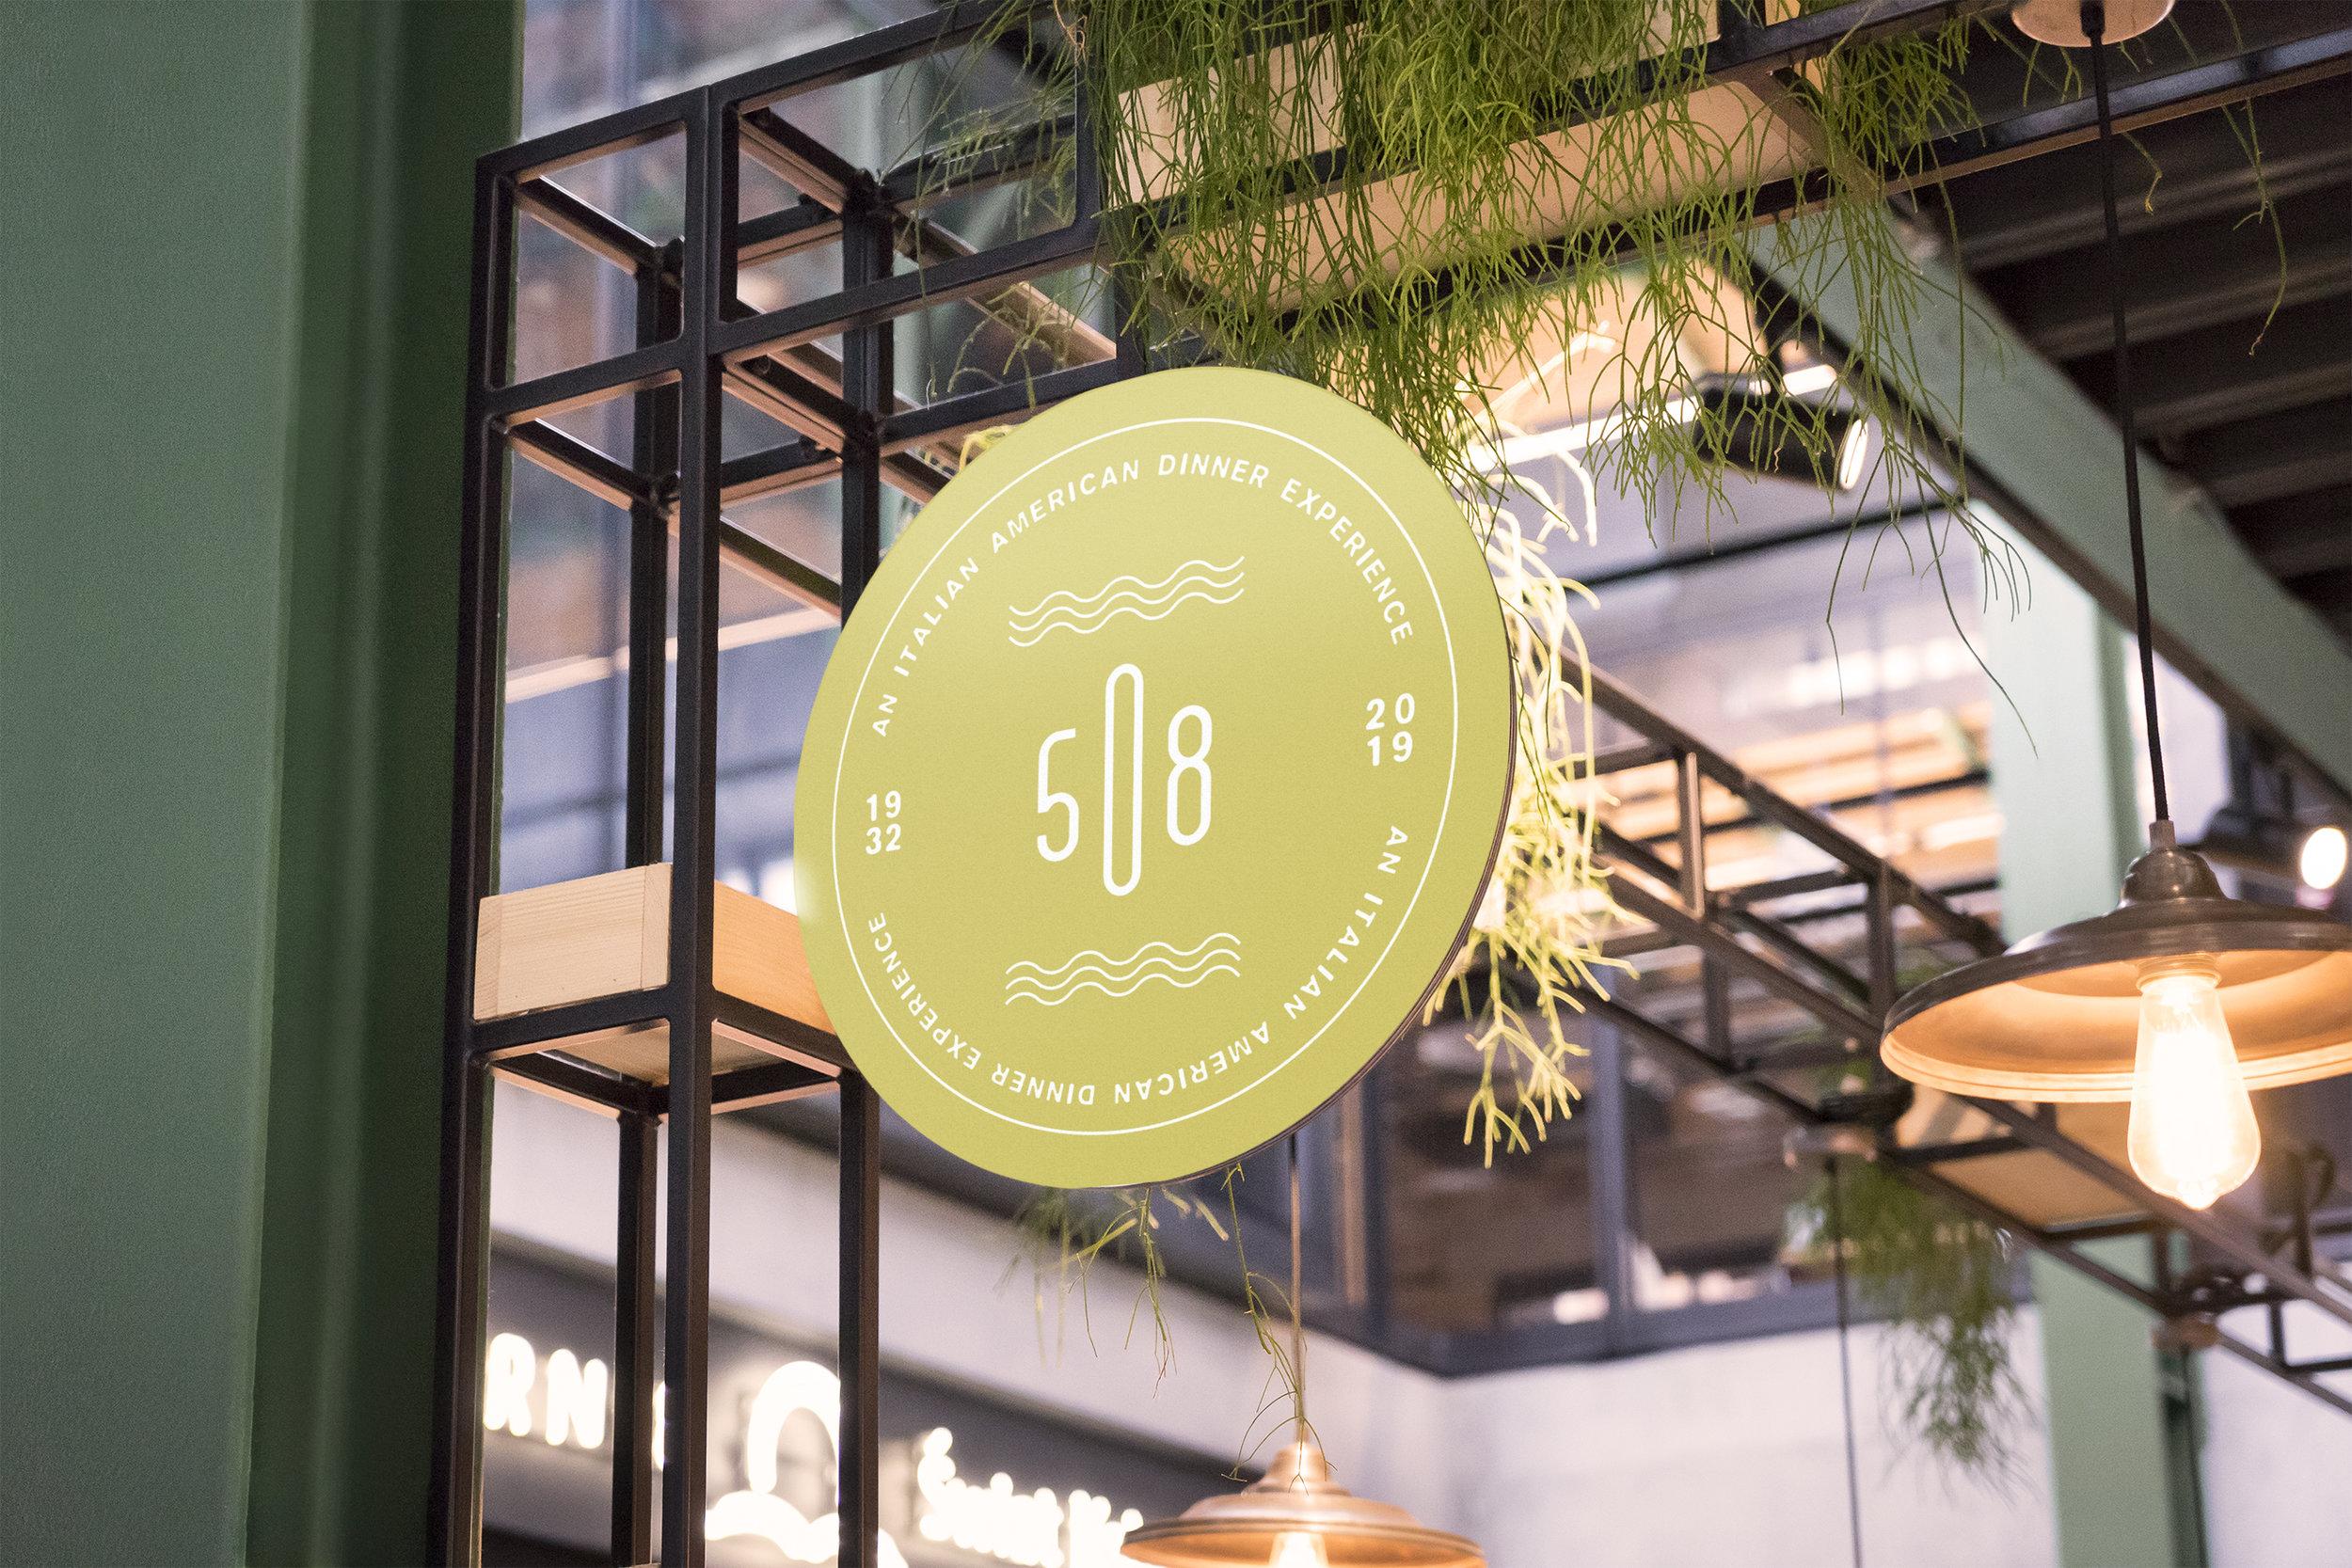 508_signage.jpg